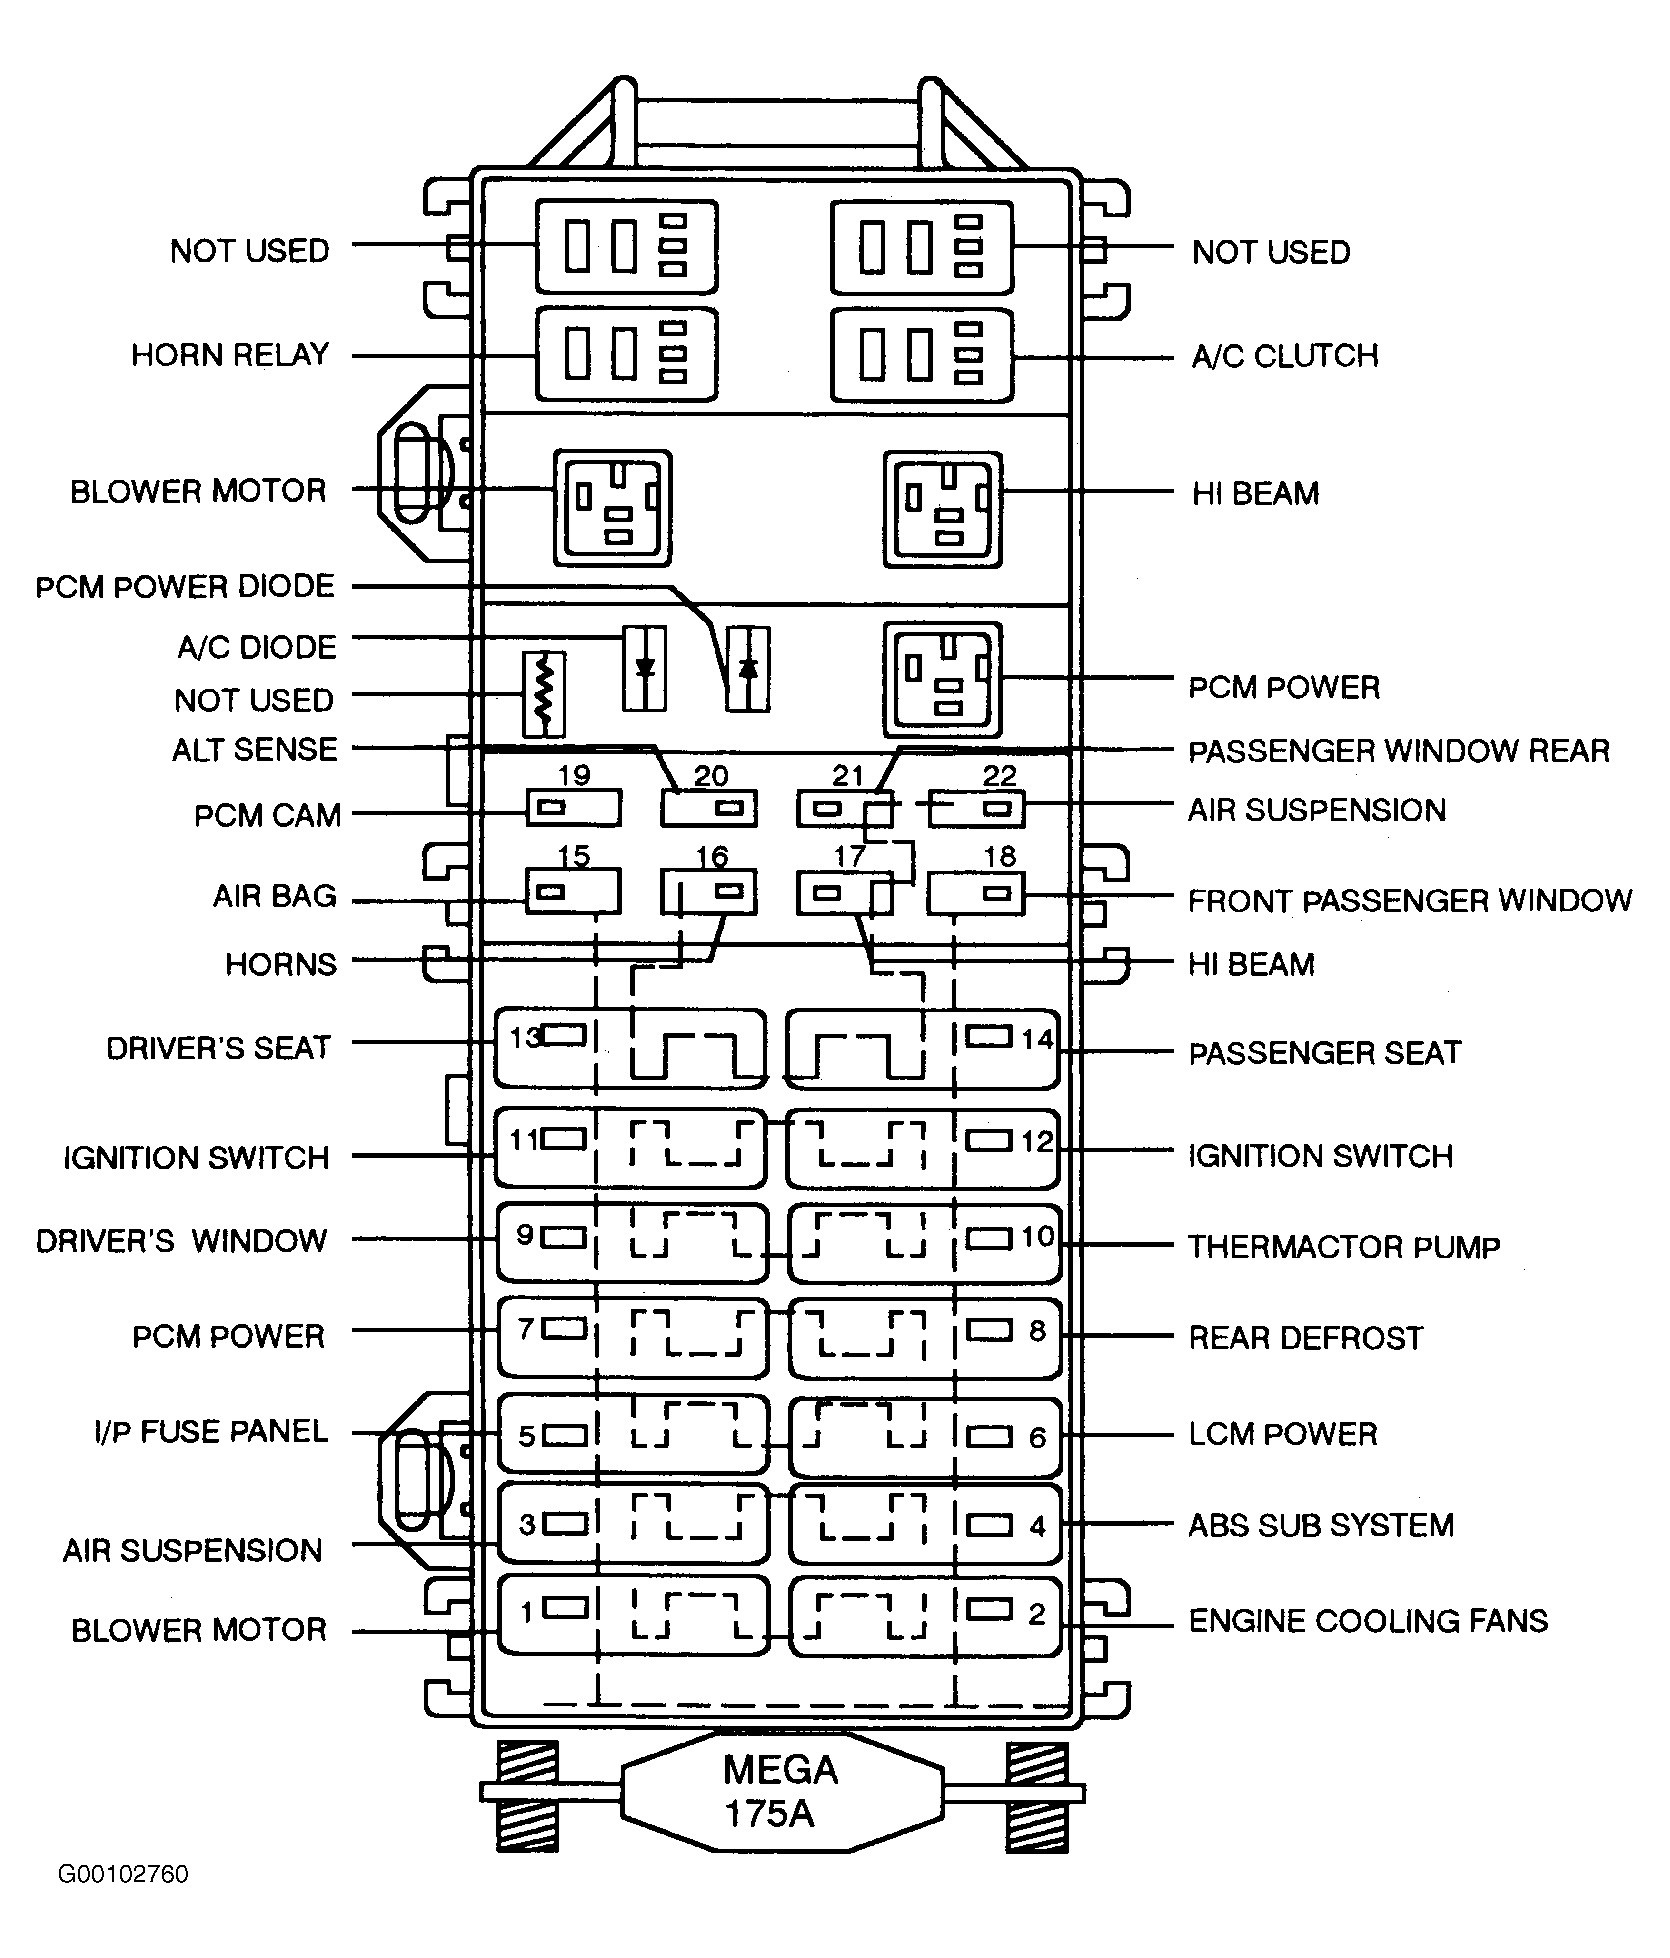 din automotive wiring diagram symbols 02 ford explorer radio jensen stereo imageresizertool com